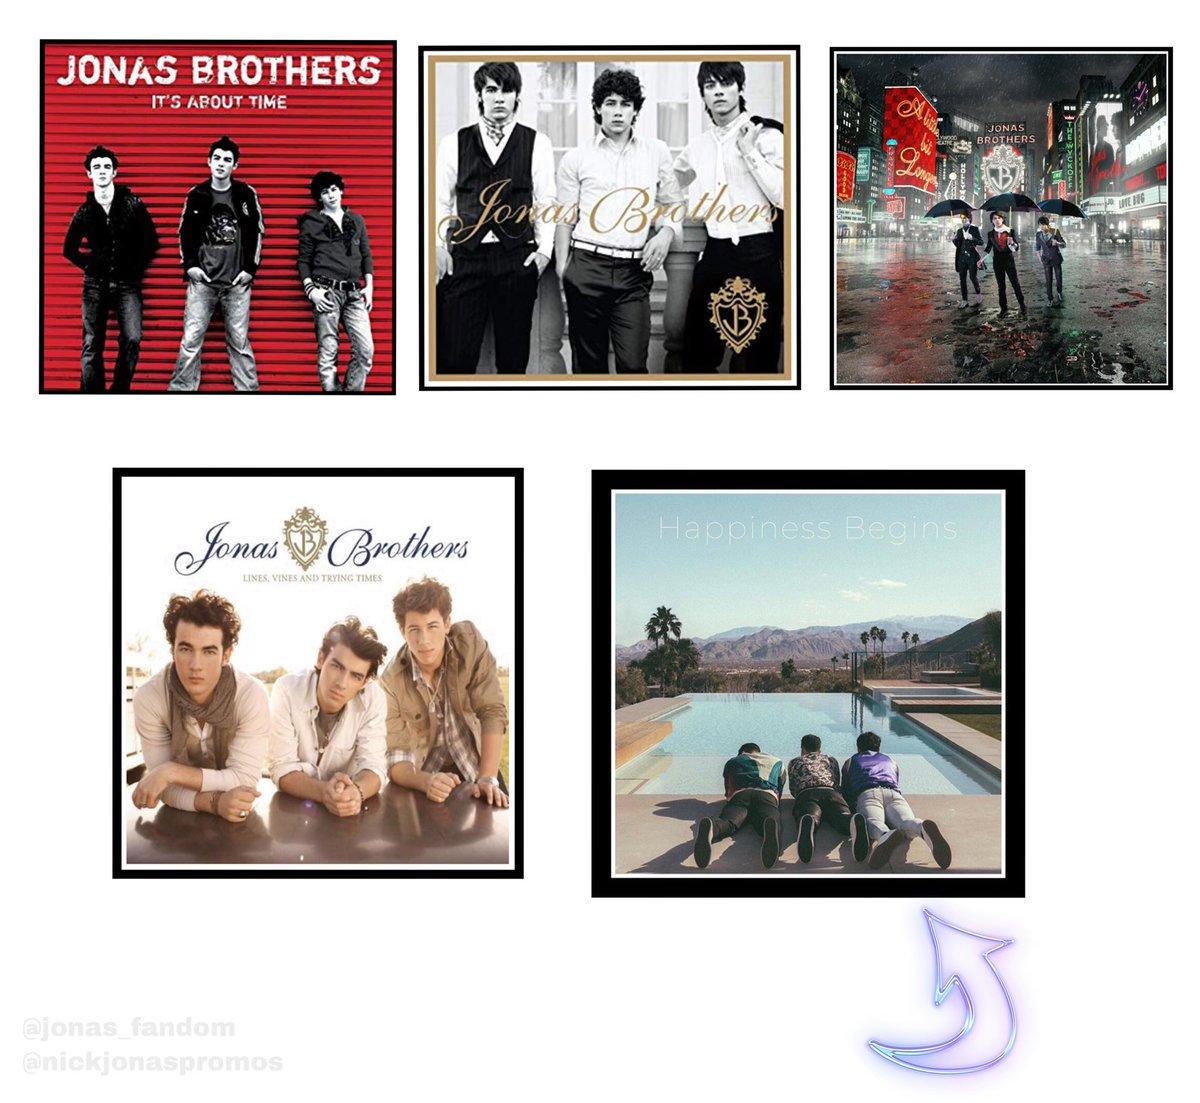 RT if you're excited about this one!! @jonasbrothers @nickjonas @joejonas @kevinjonas #JonasBrothersAlbums   #HappinessBegins  #AlbumOfTheYear <br>http://pic.twitter.com/eZKcj85ZSX